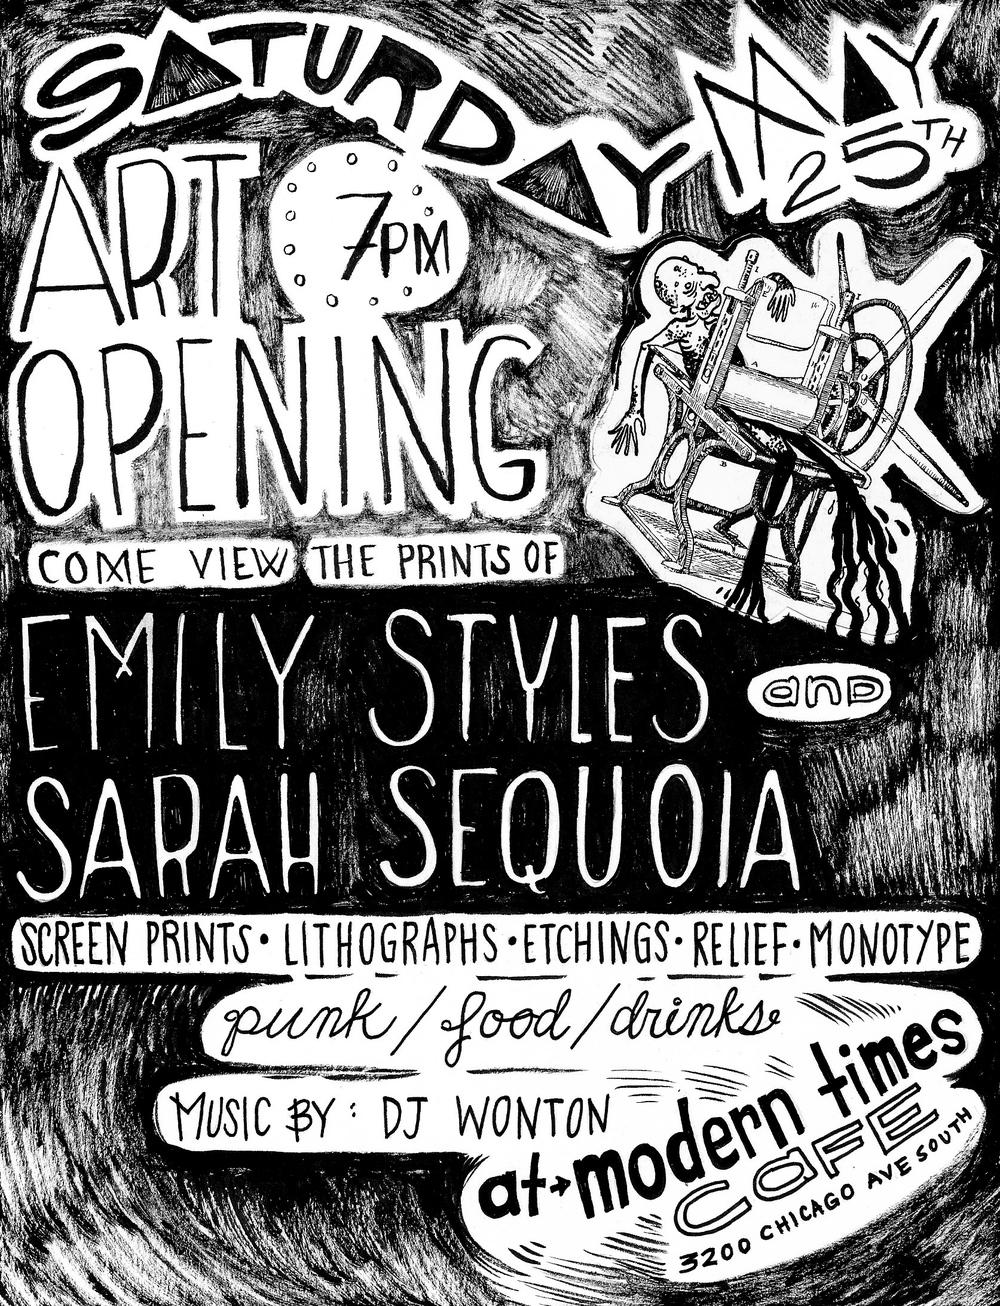 ART OPENING.jpg